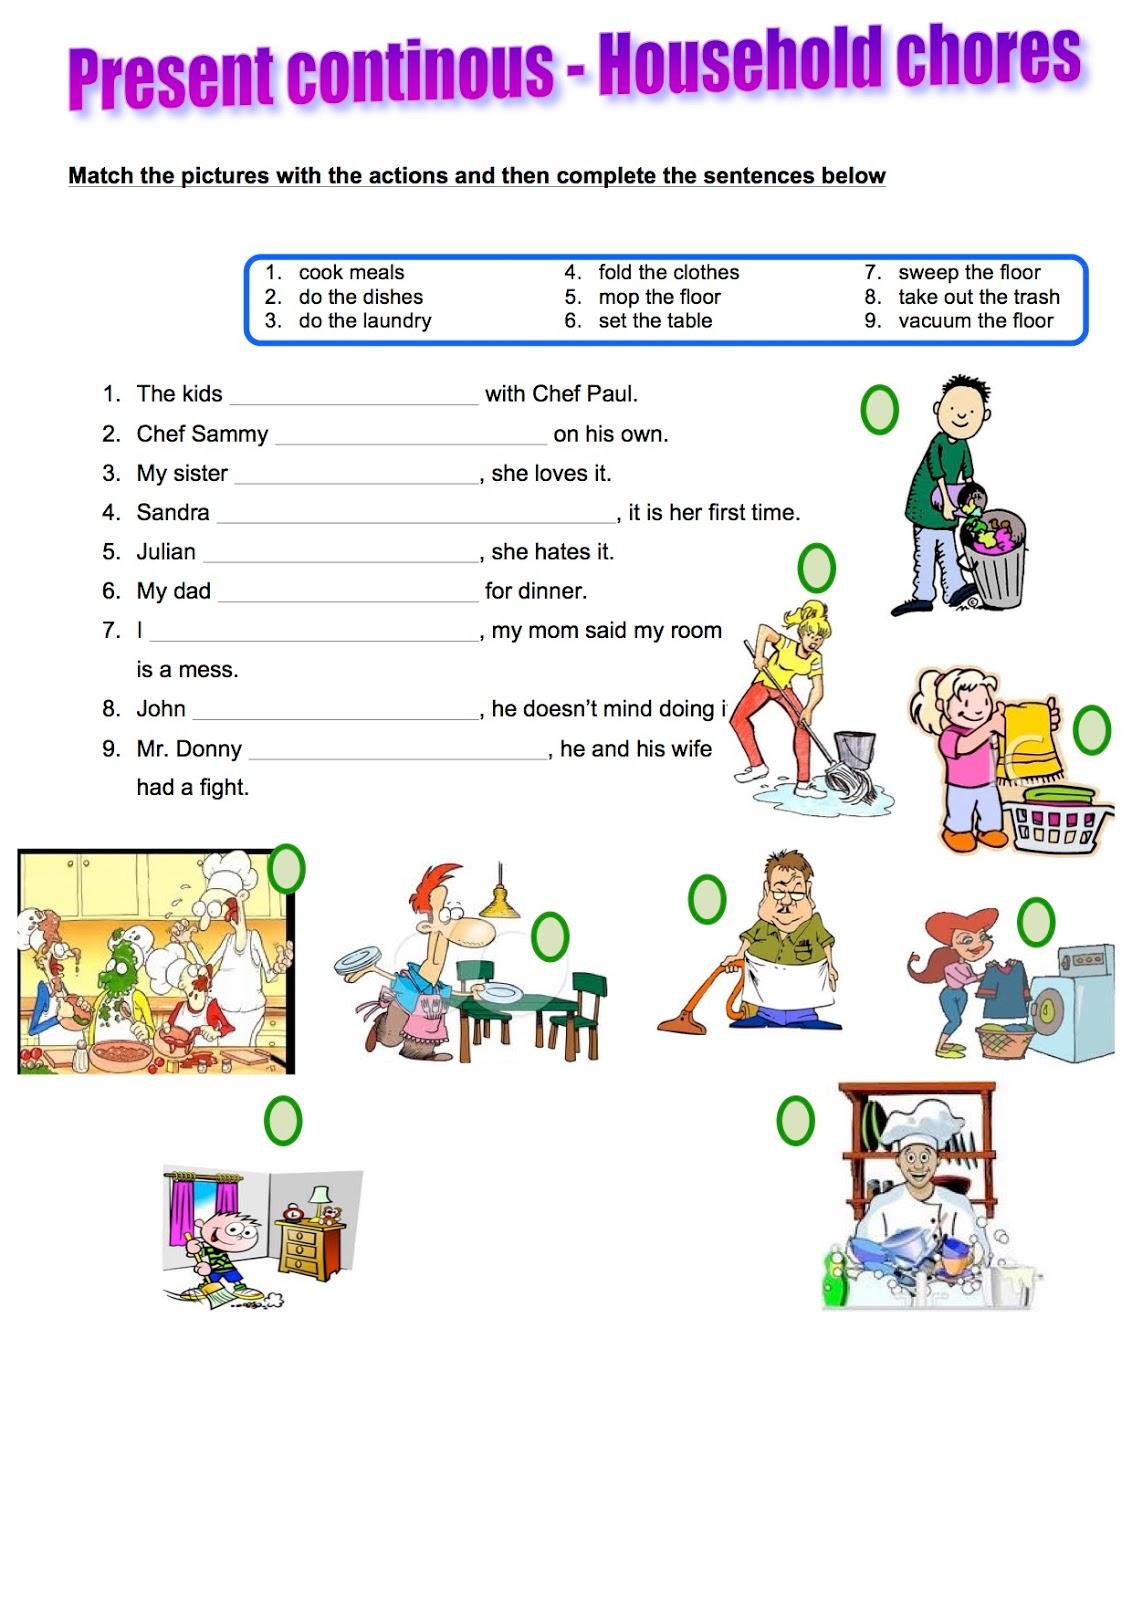 Maru S Blog Present Continuous Presentation Lesson